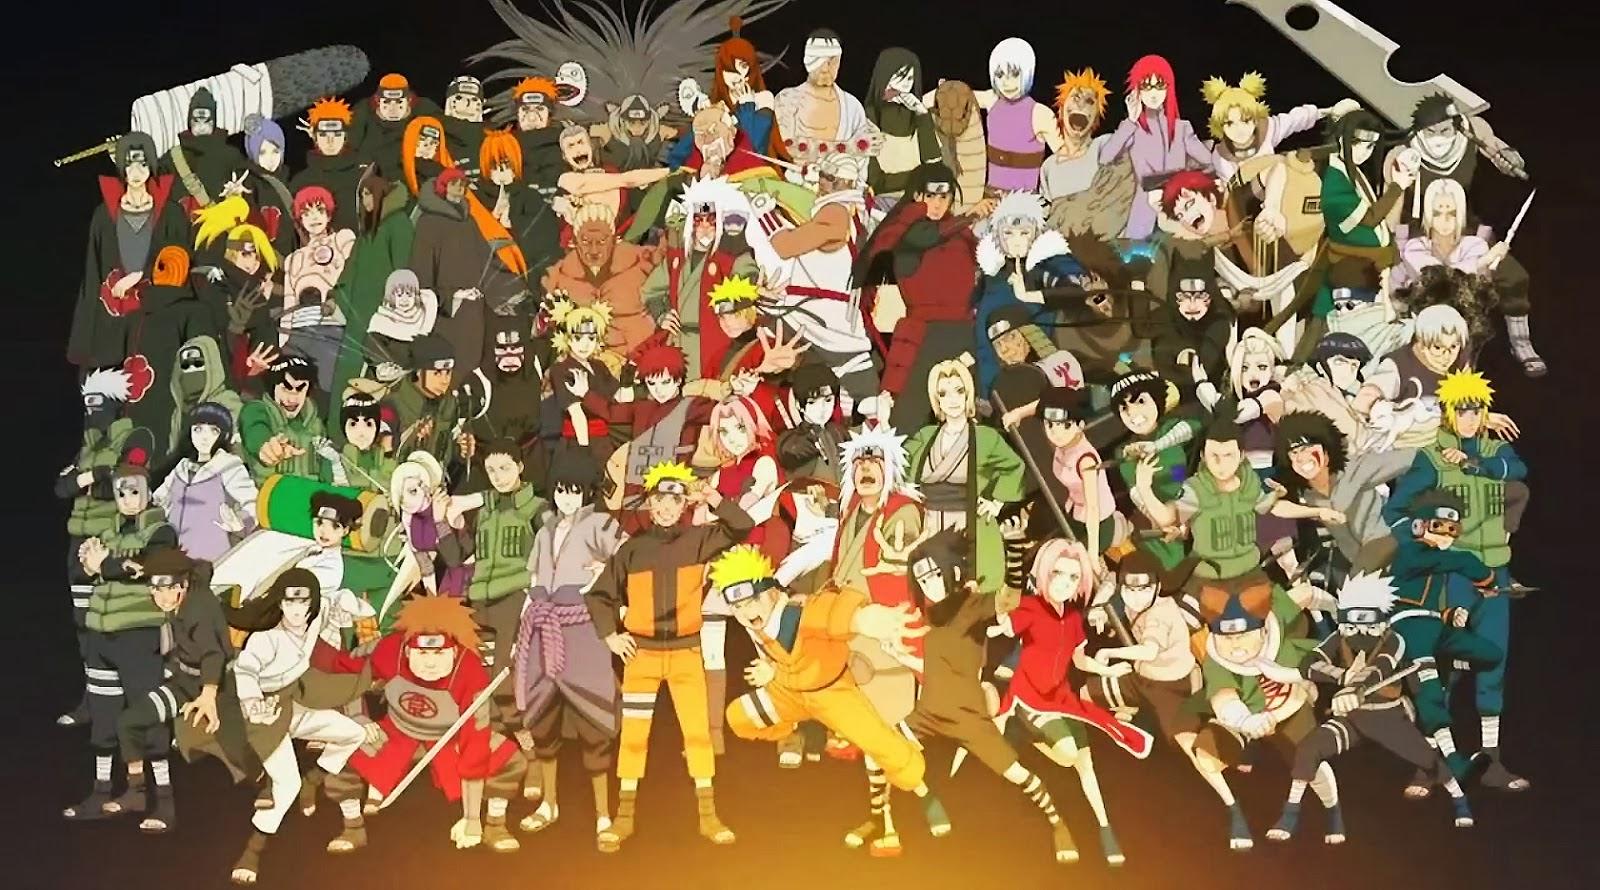 Kata Kata Bijak Dalam Anime Naruto Shippuden Terbaru Unik Dan